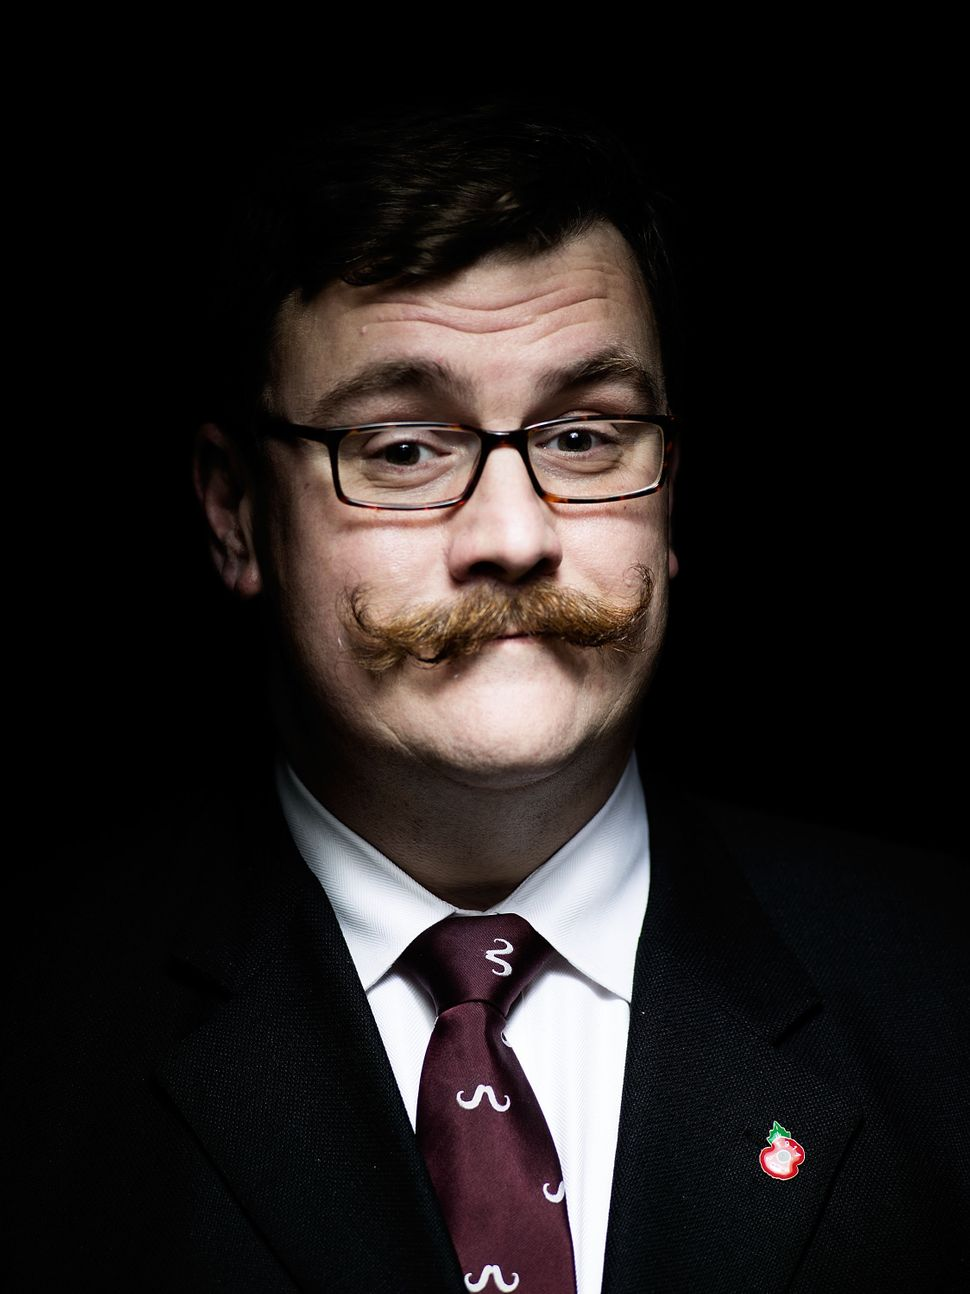 Handlebar Club member Ryan Pike, sporting an unwaxed classic handlebar moustache.